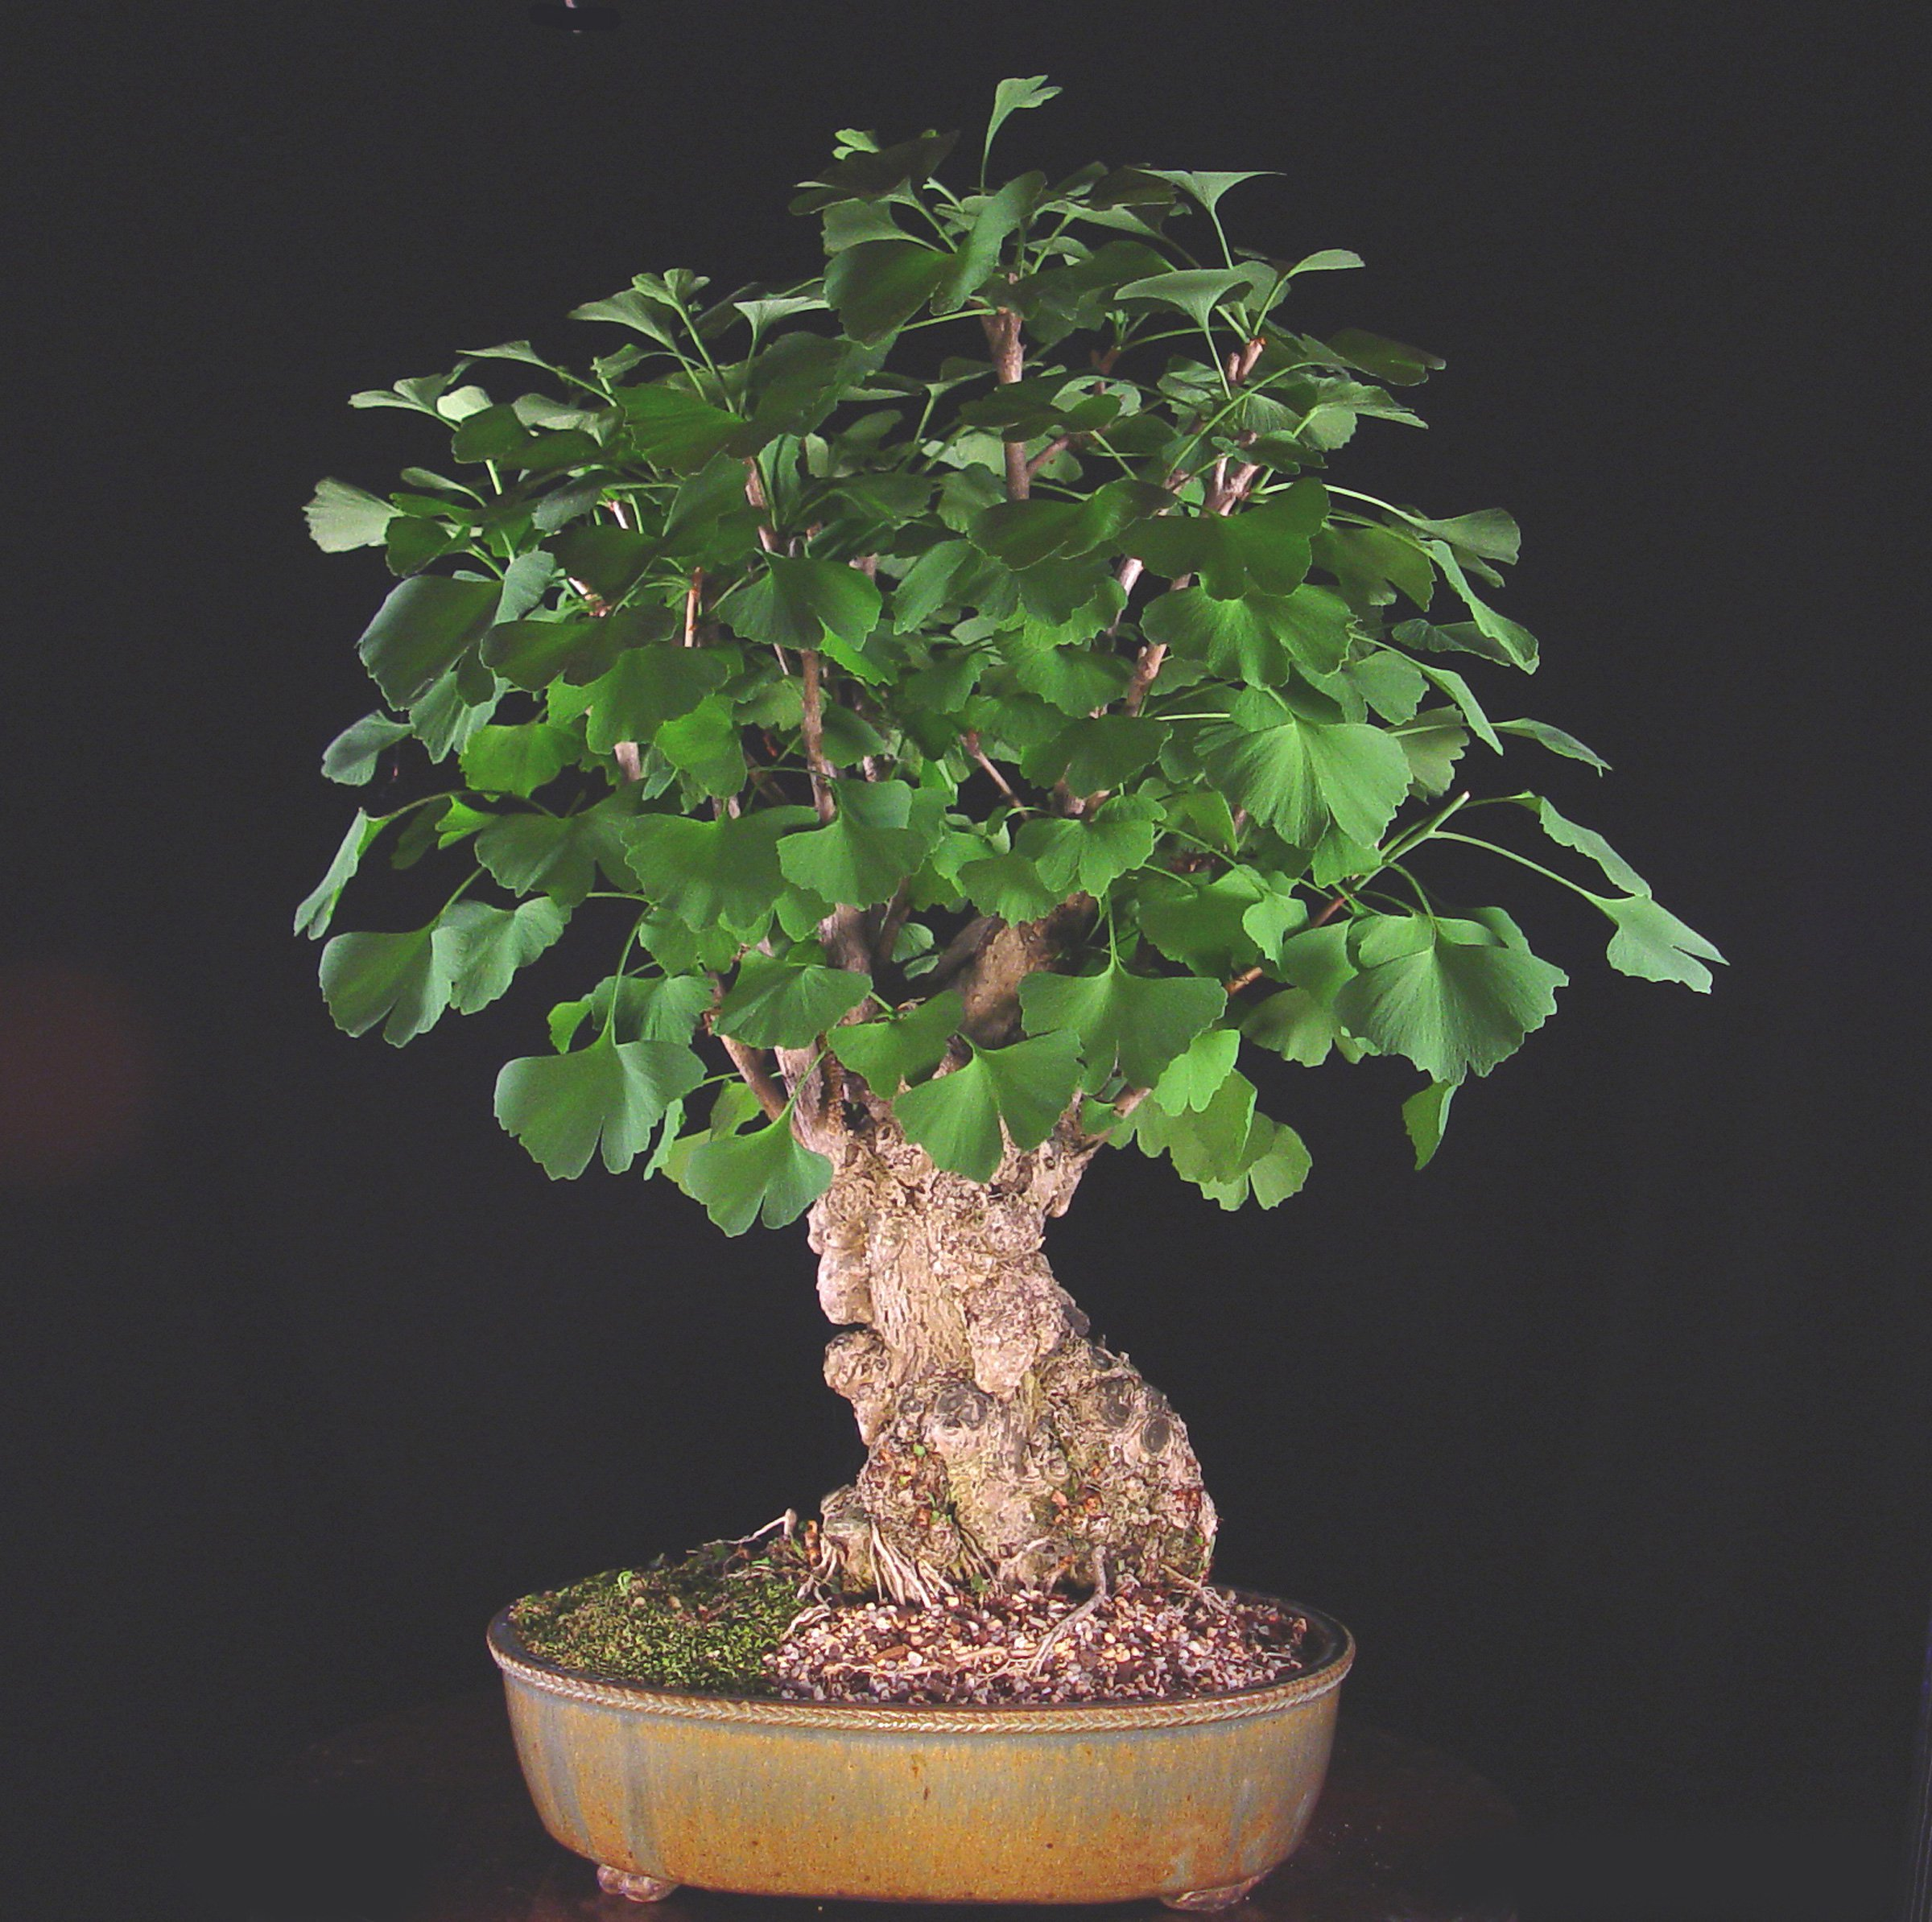 Maidenhair tree bonsai photo